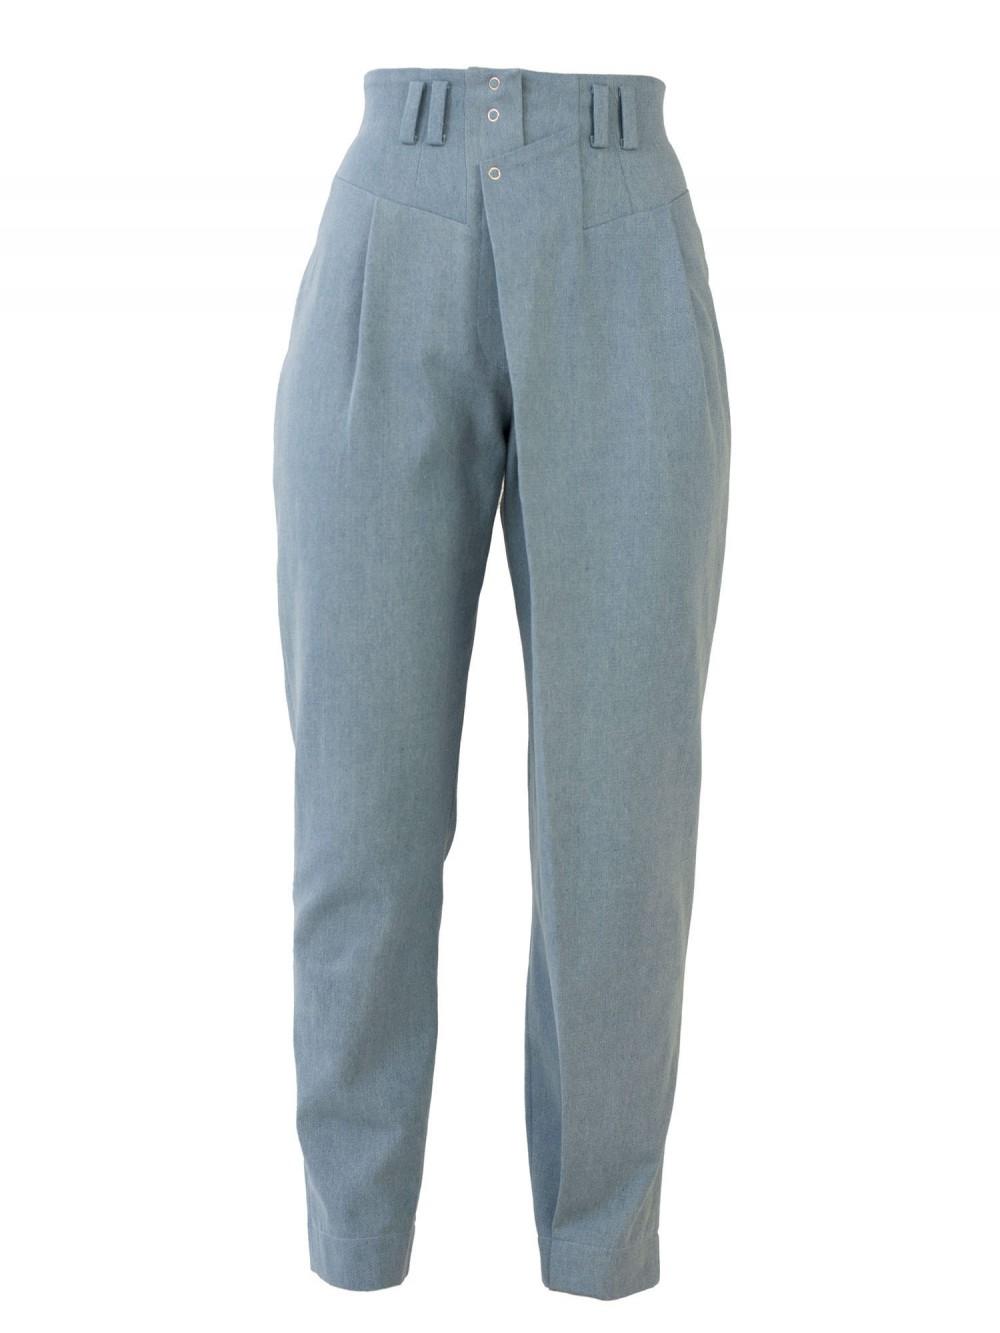 High rise straight leg jeans   L.O.N.E.L.Y